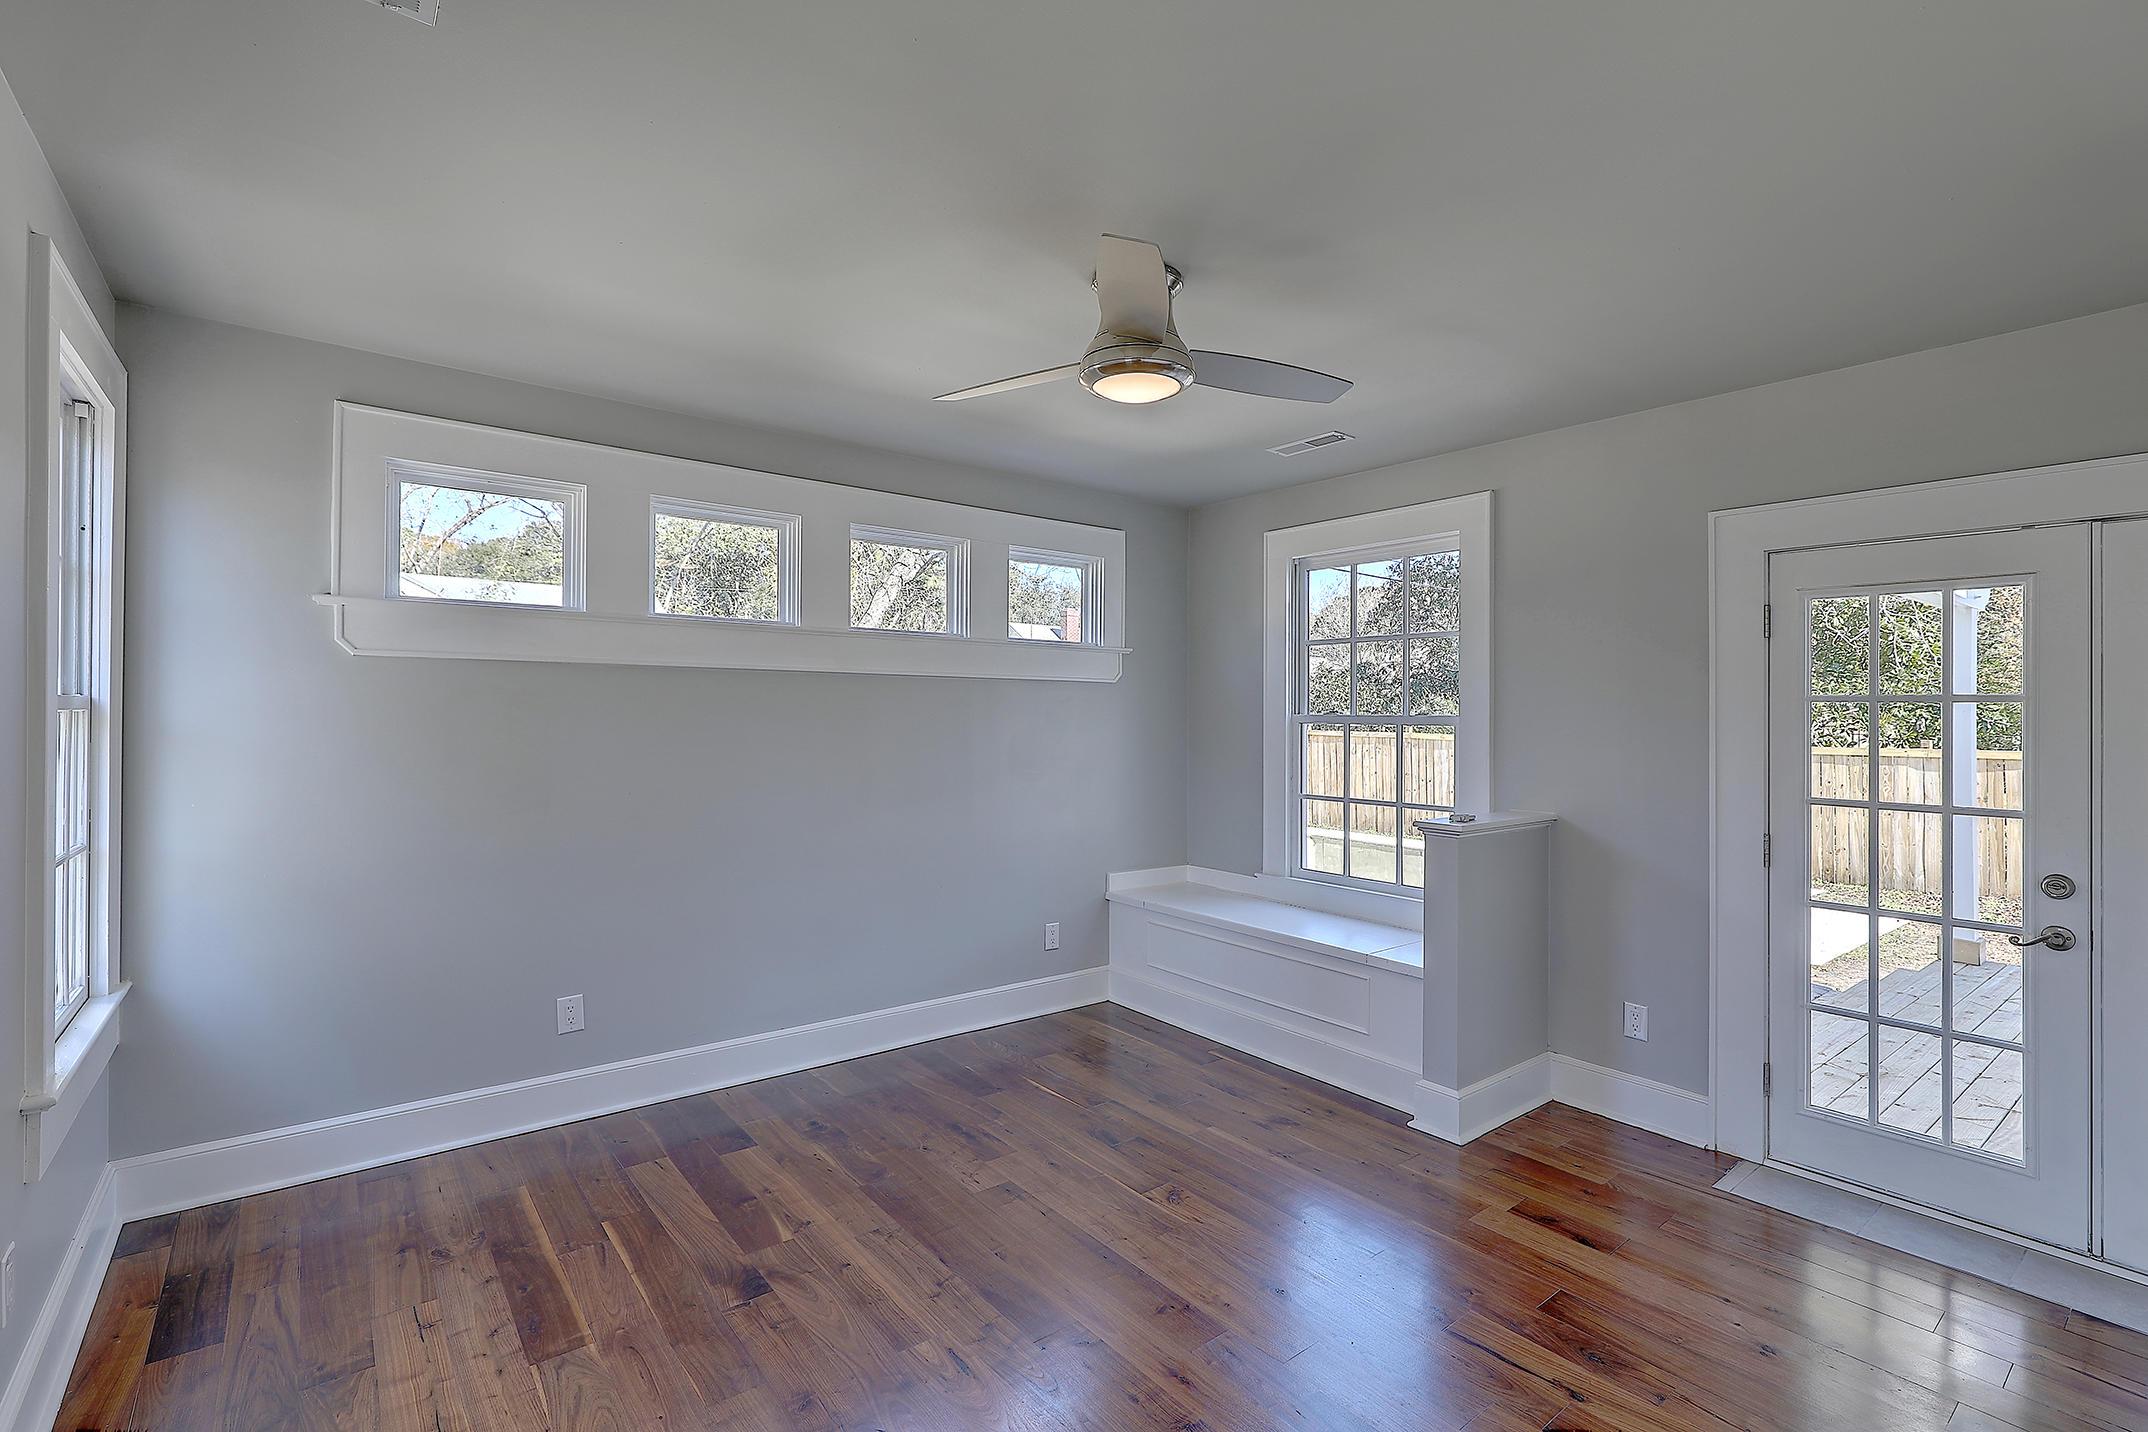 Riverland Terrace Homes For Sale - 2166 St James, Charleston, SC - 27